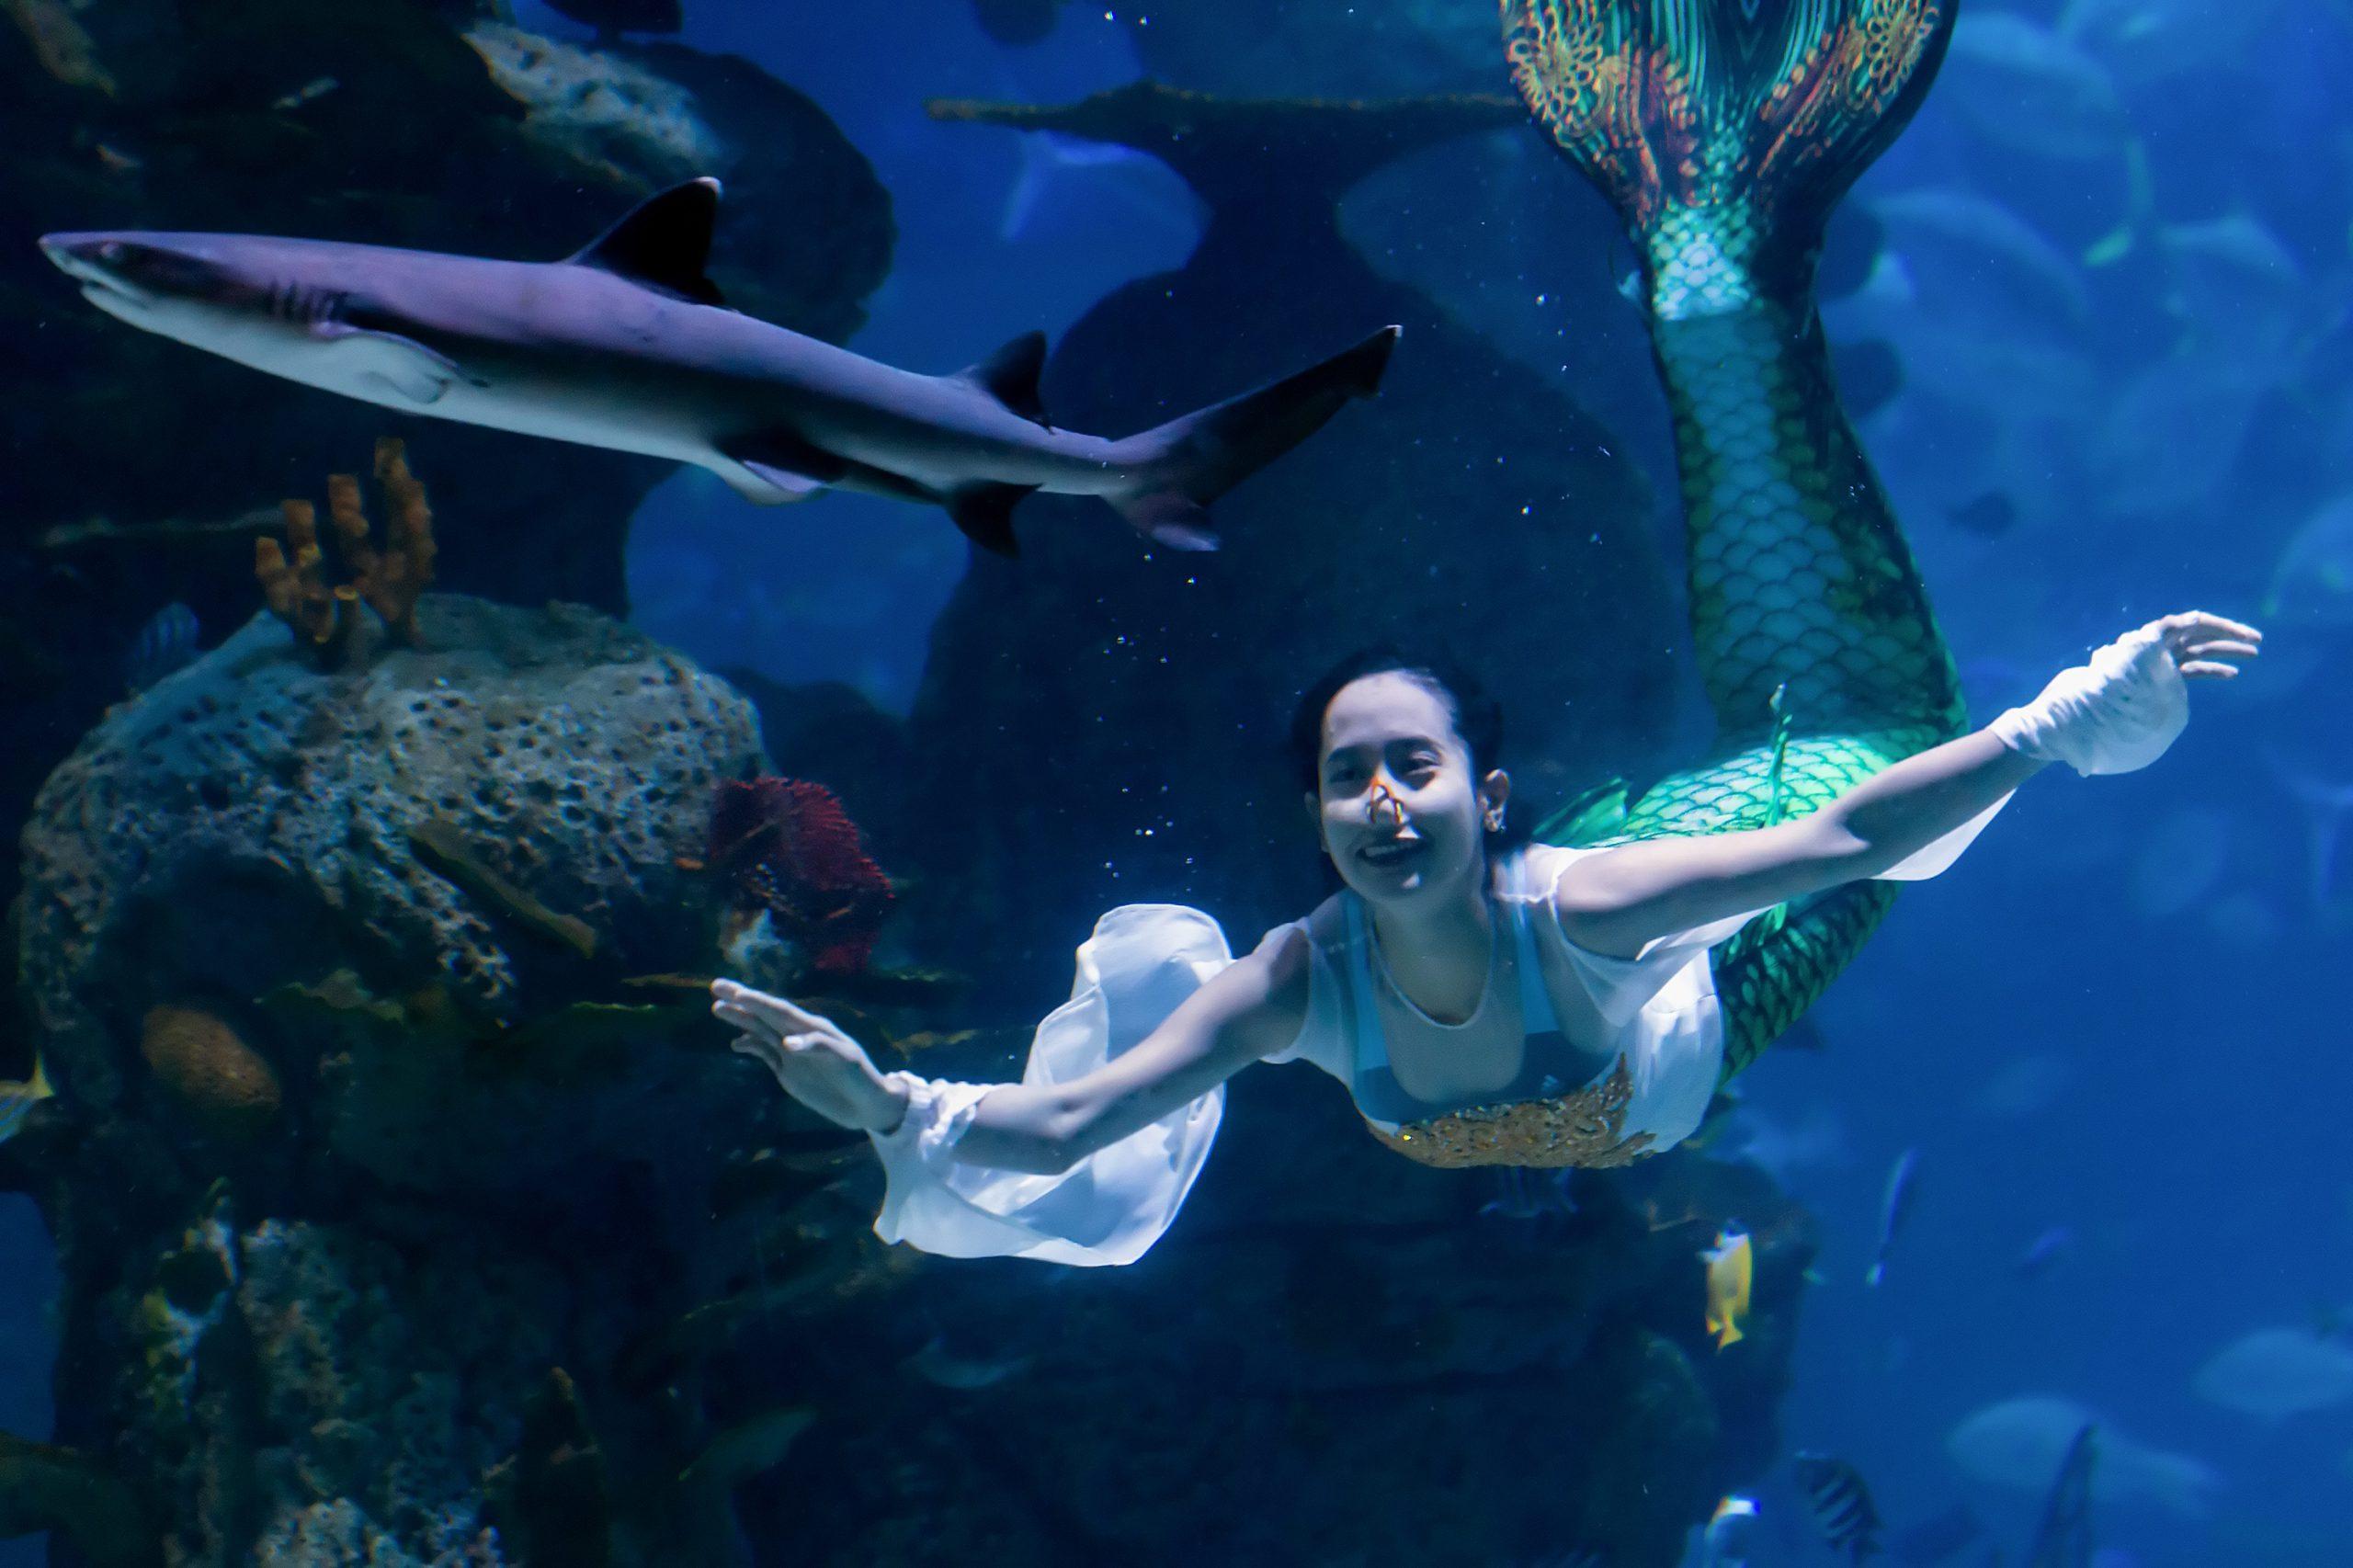 Sirena-nuota